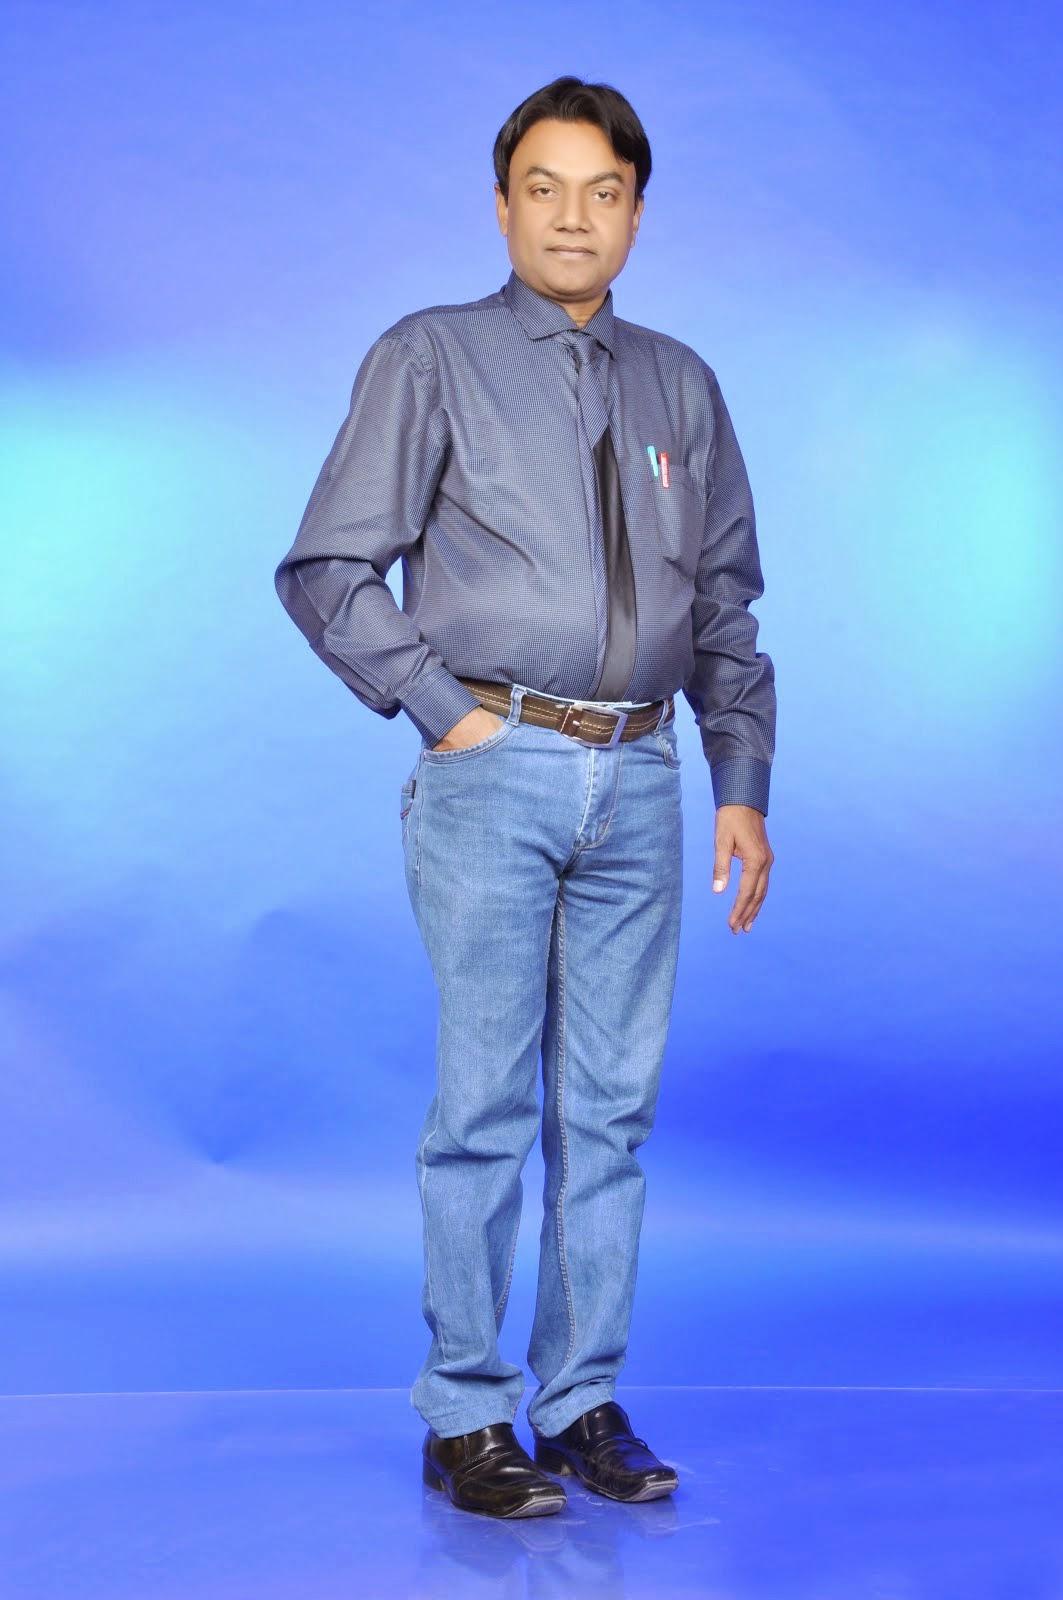 Rajkumar Soni